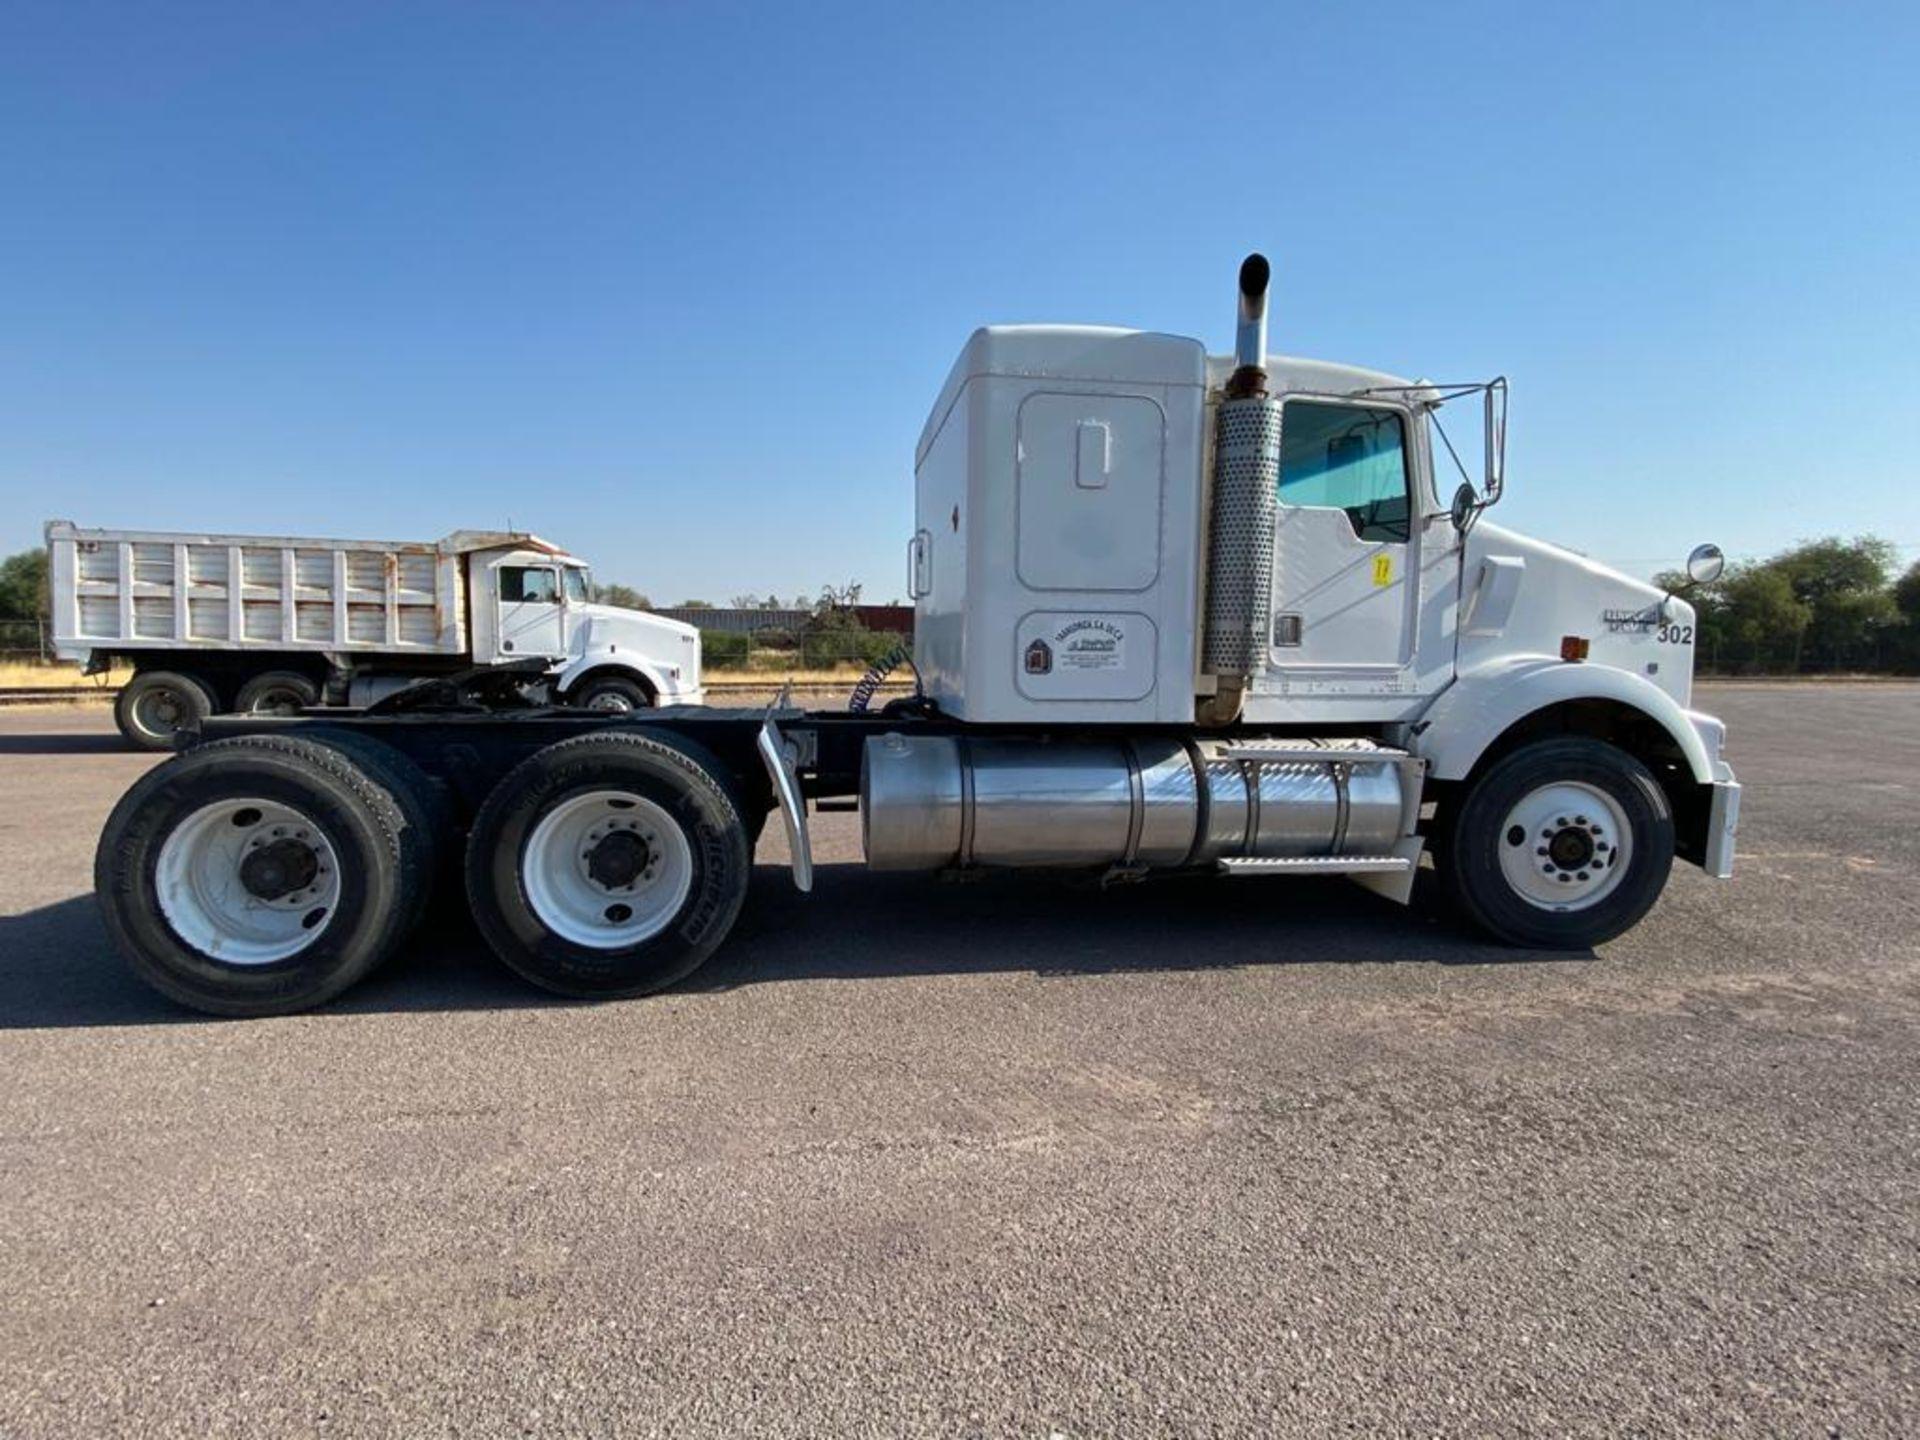 1998 Kenworth Sleeper Truck Tractor, standard transmission of 18 speeds - Image 16 of 55